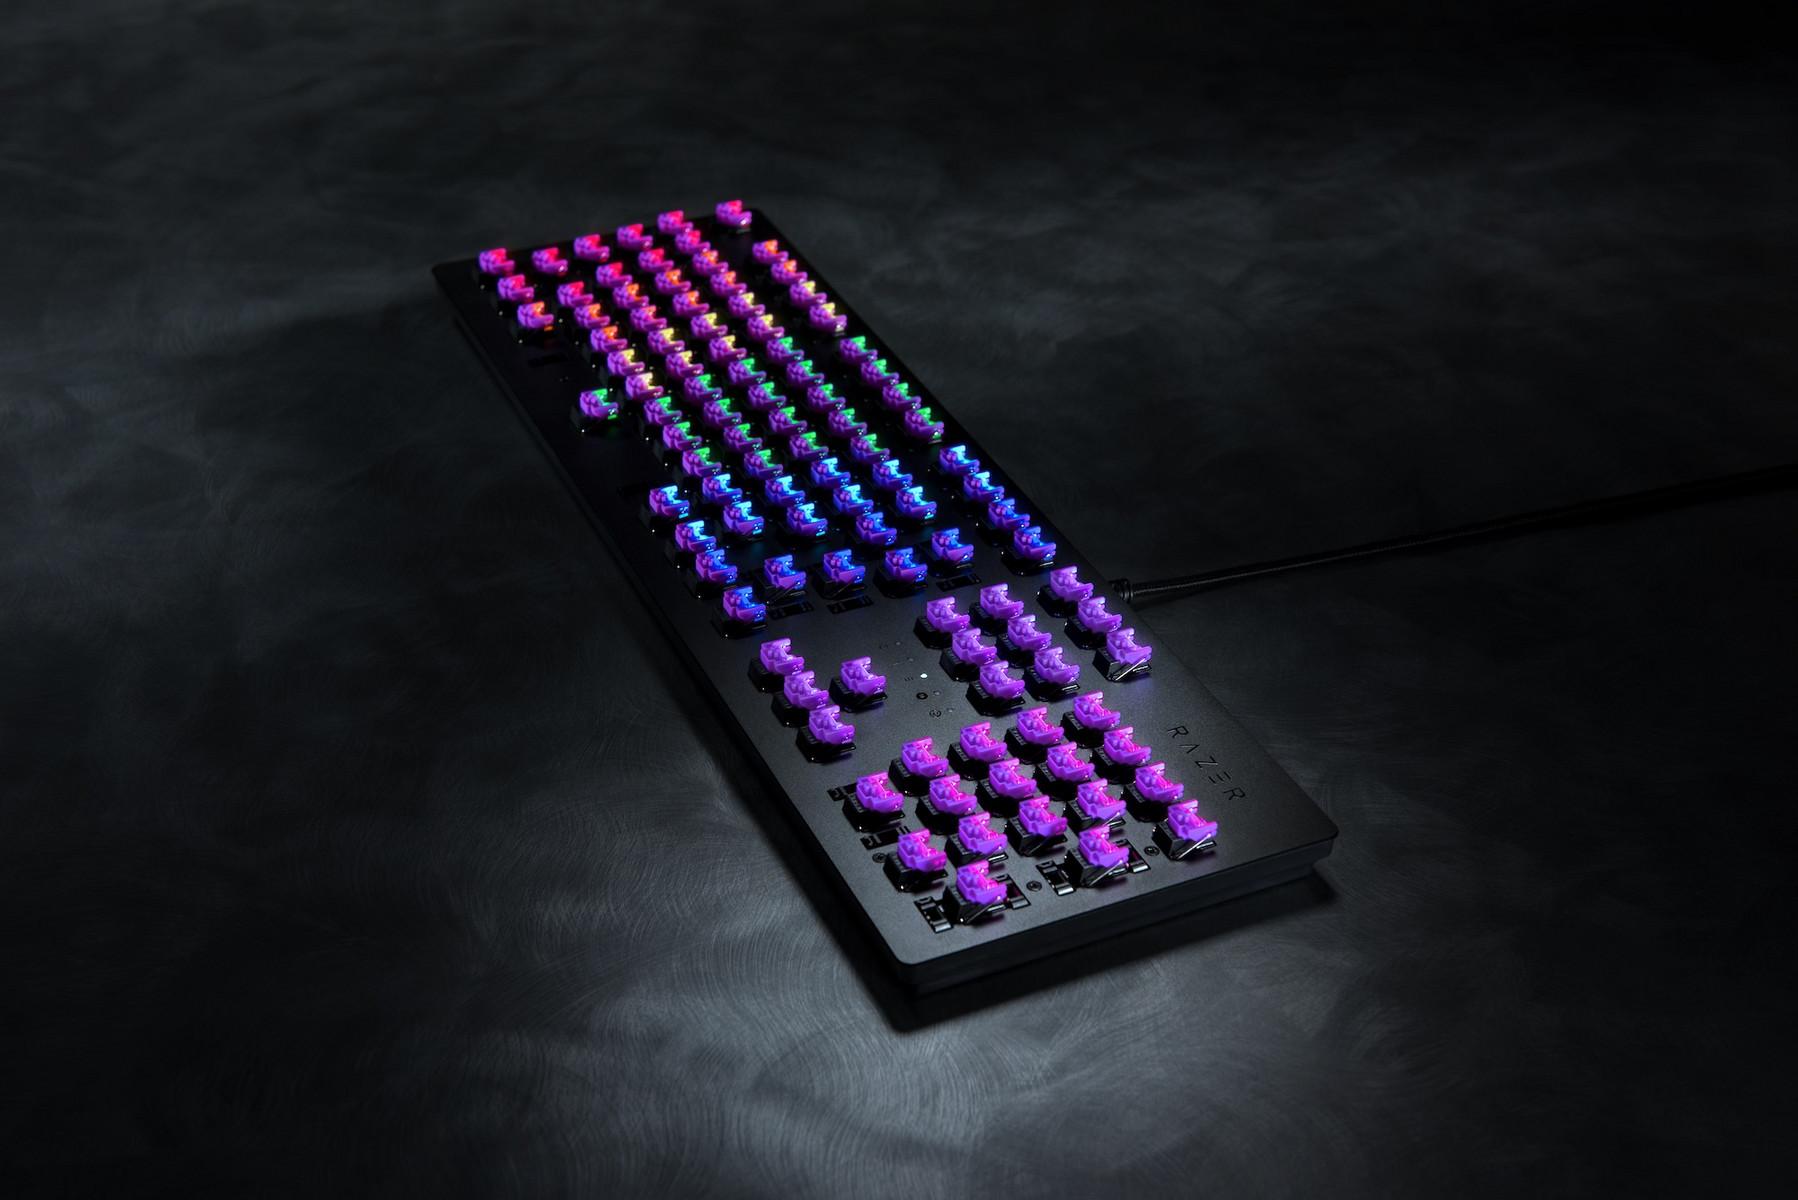 Razer Huntsman: Gaming-Tastaturen mit Opto-Mechanischen